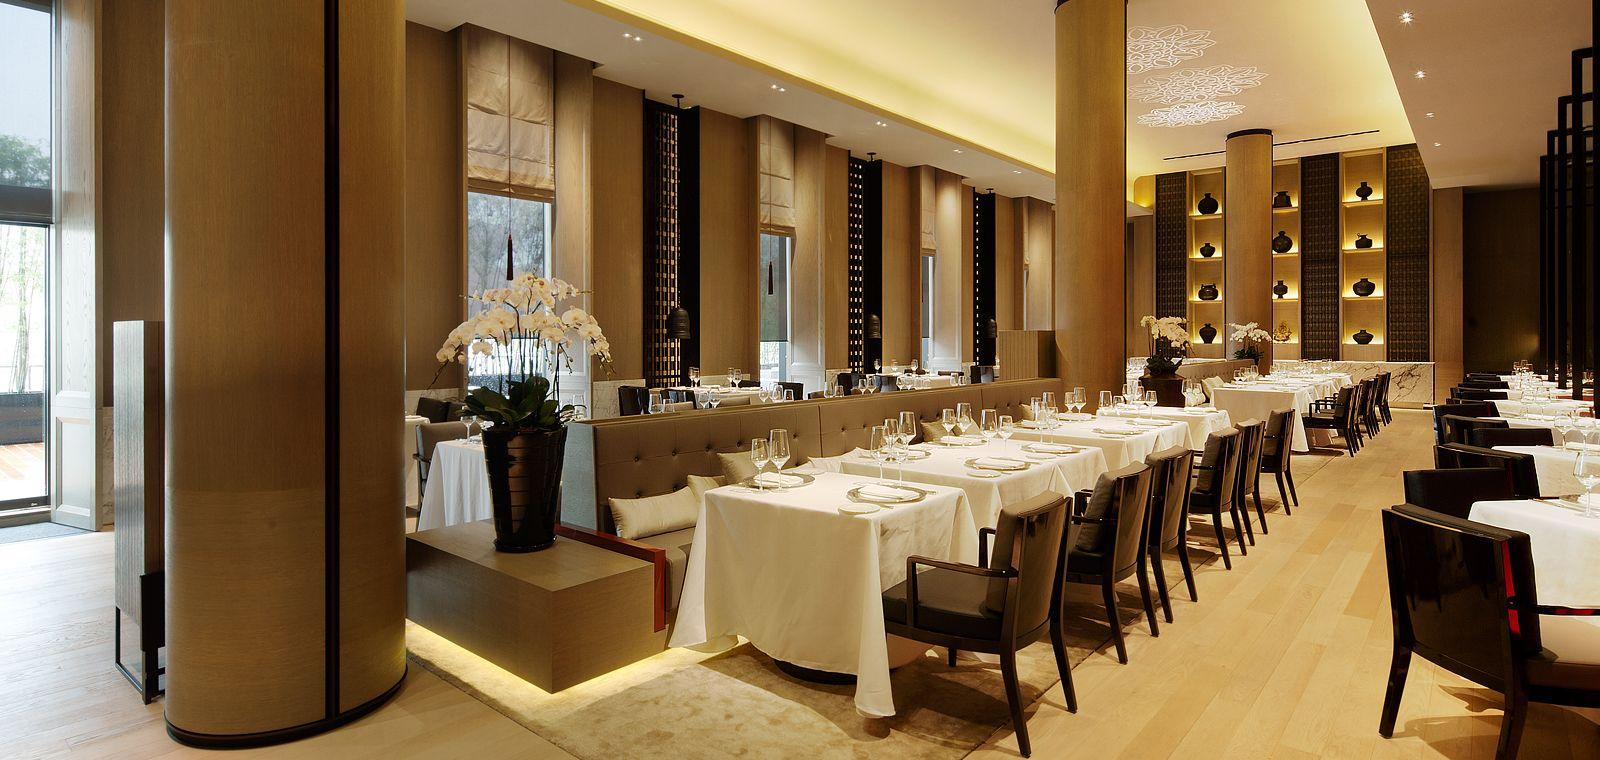 restaurant design - Google Search   Restaurant, Dining, Bar ...